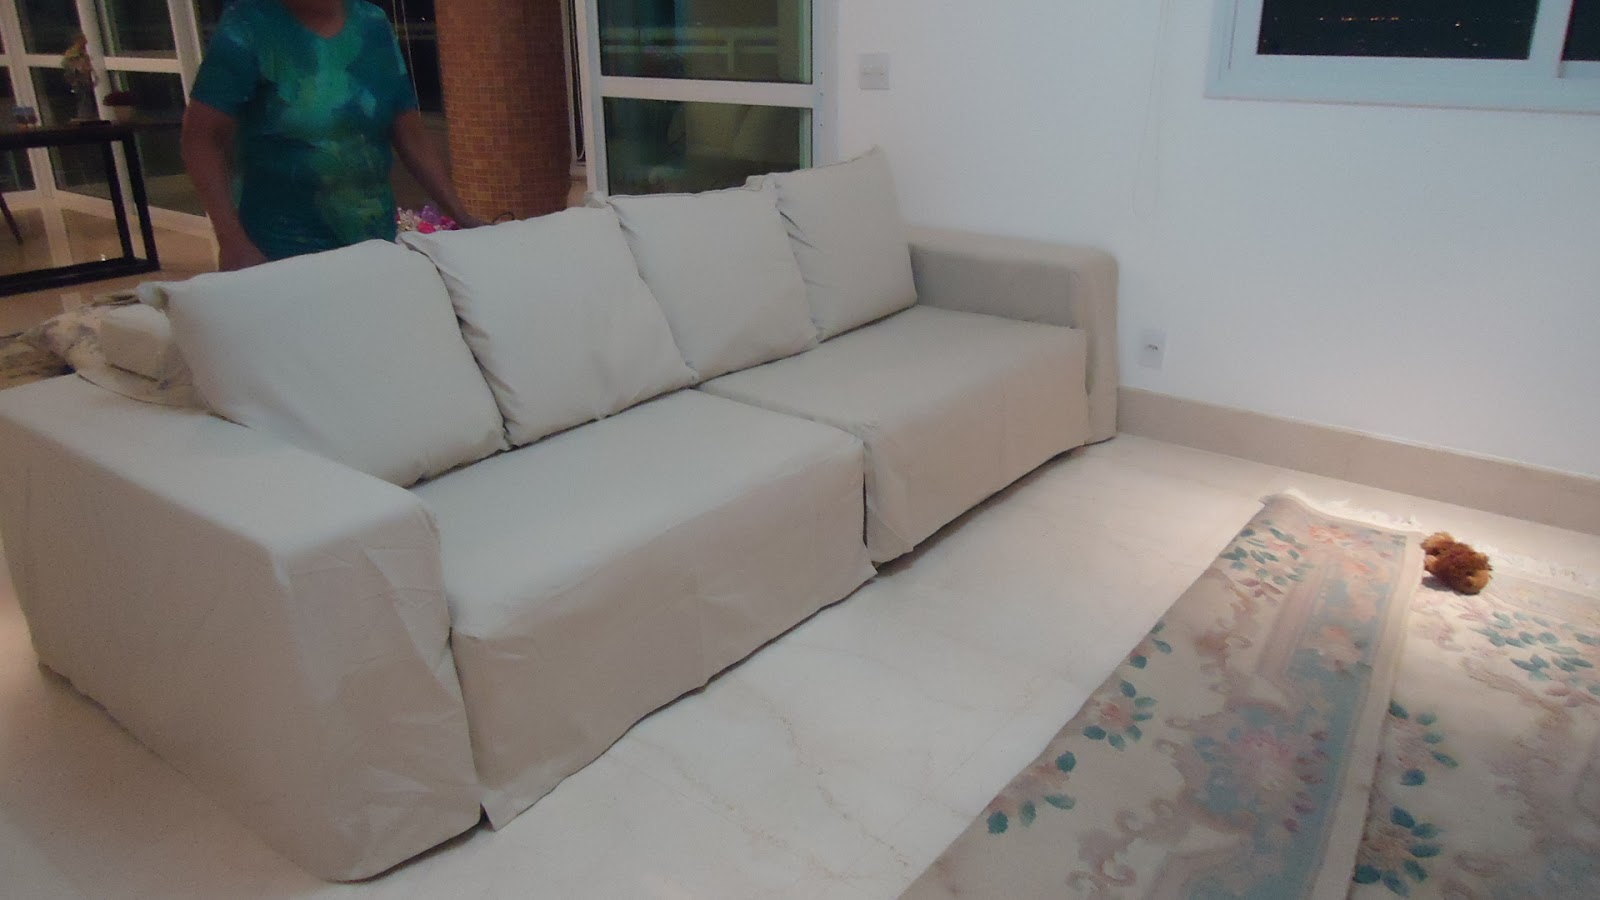 Menor Preco Em Sofa Estofado 3 Lugares No Buscape